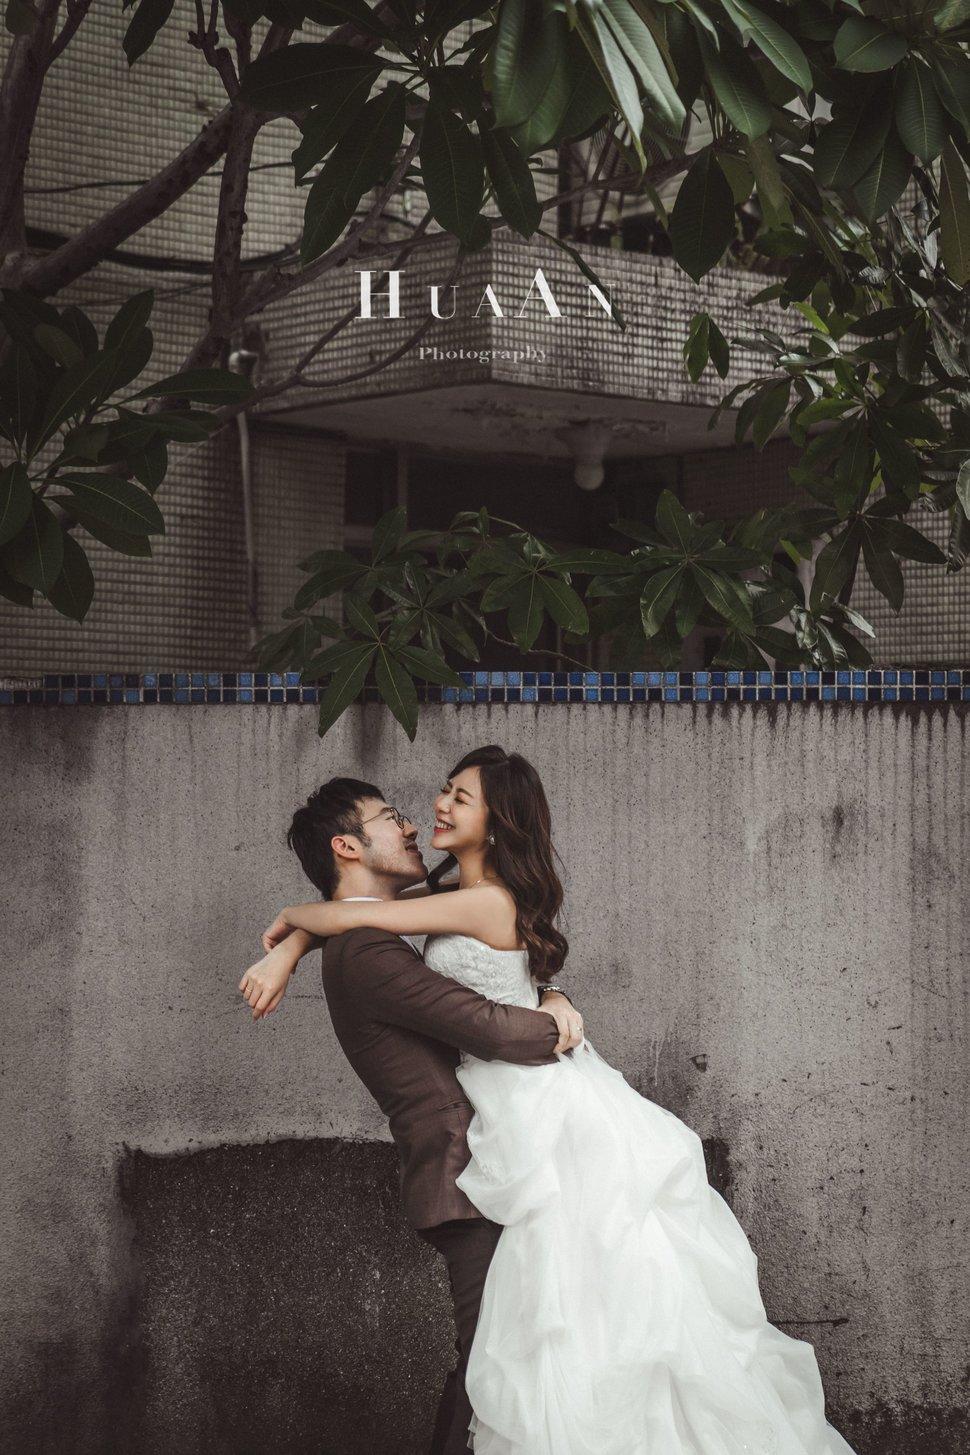 HUA00820 - Huaan Photography《結婚吧》